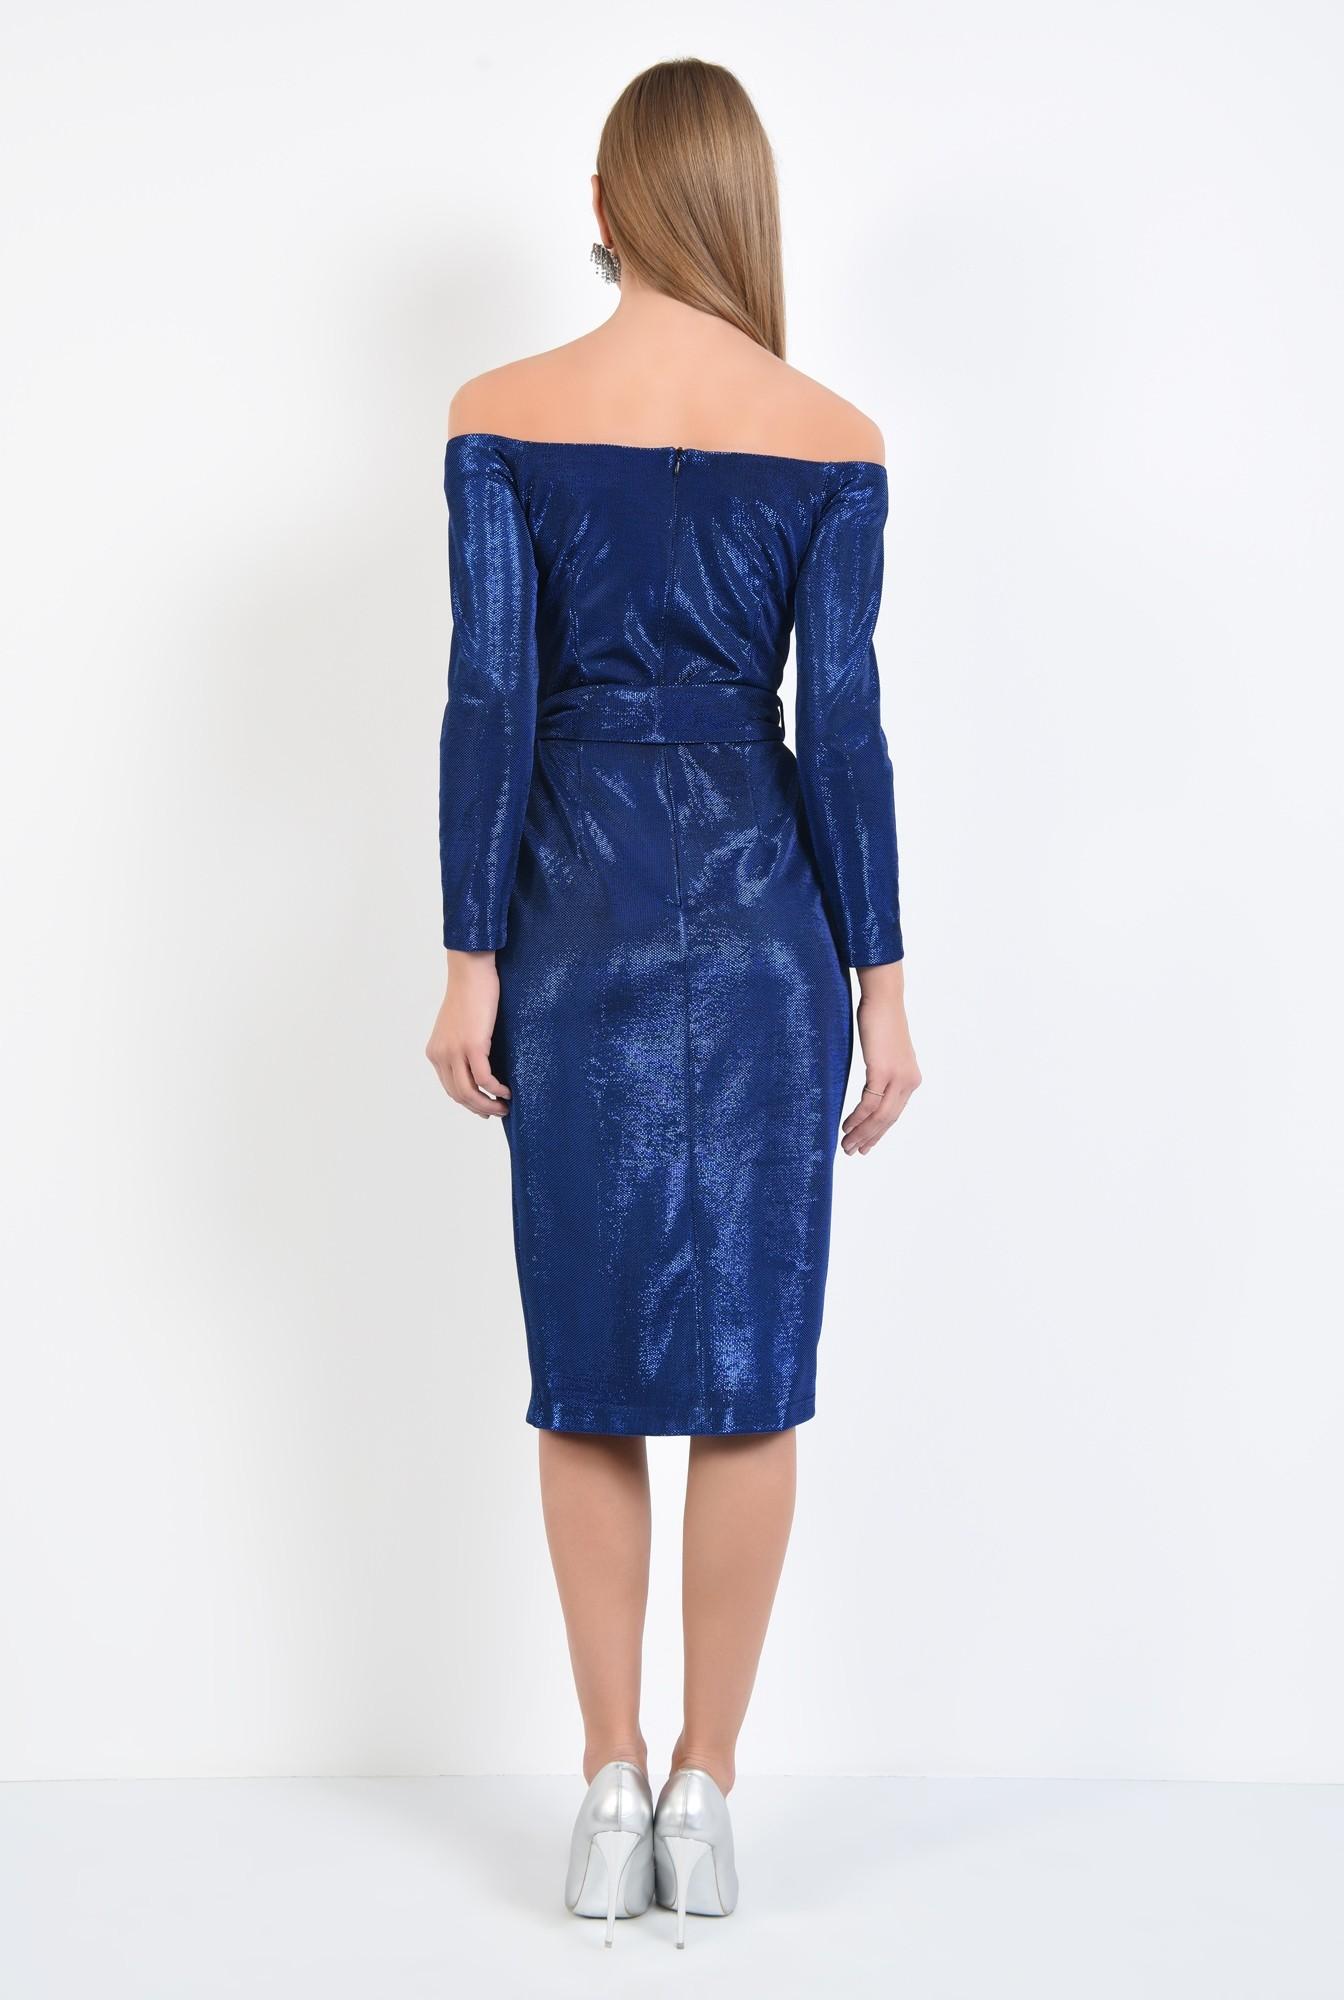 1 - rochie eleganta, midi, conica, cu cordon, rochii online